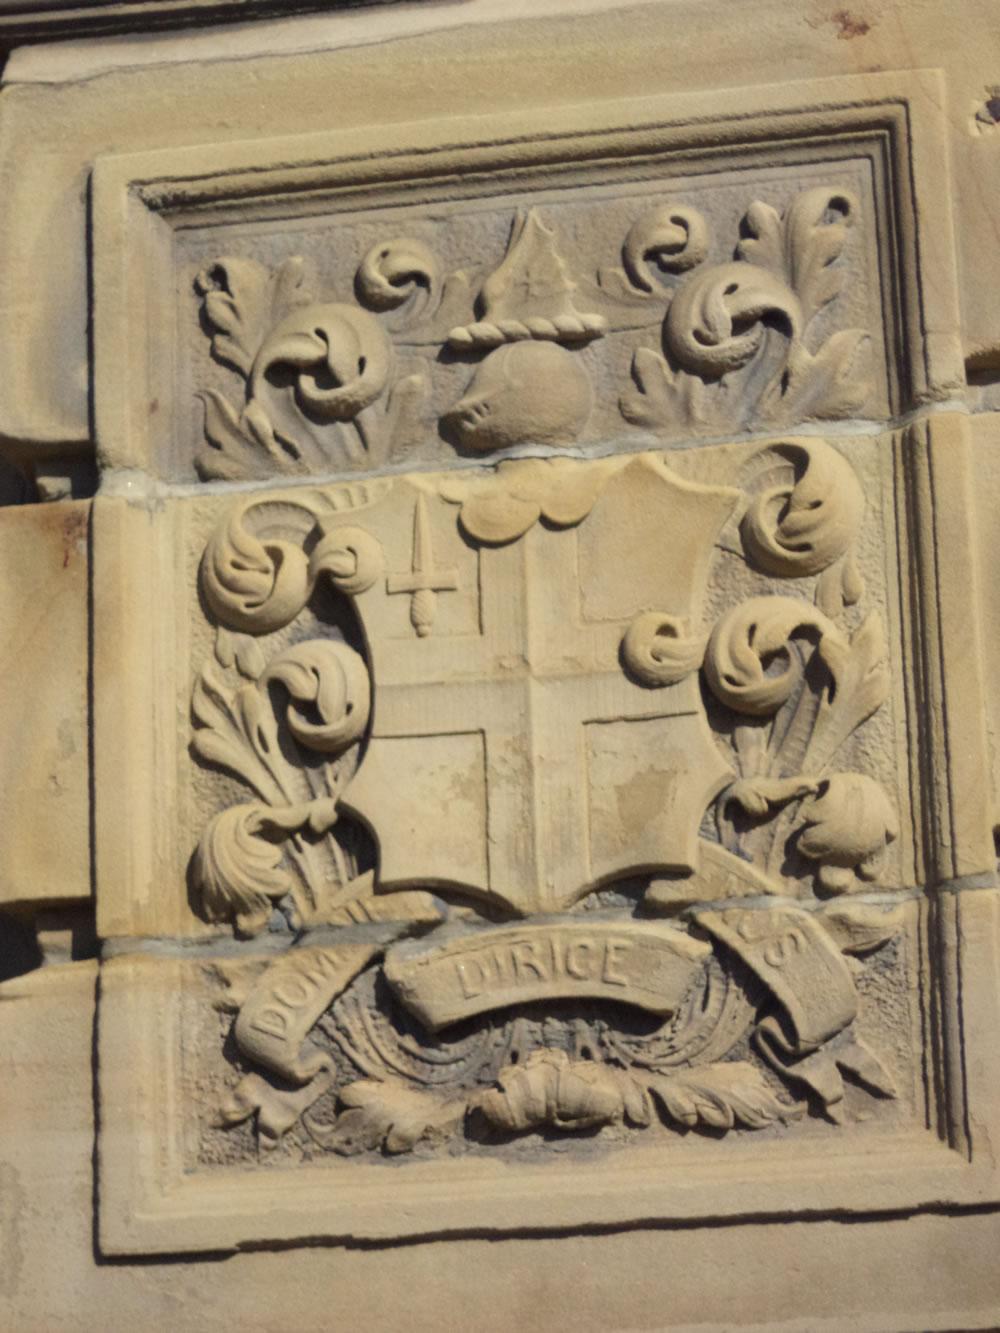 Midland railway crest Bradford